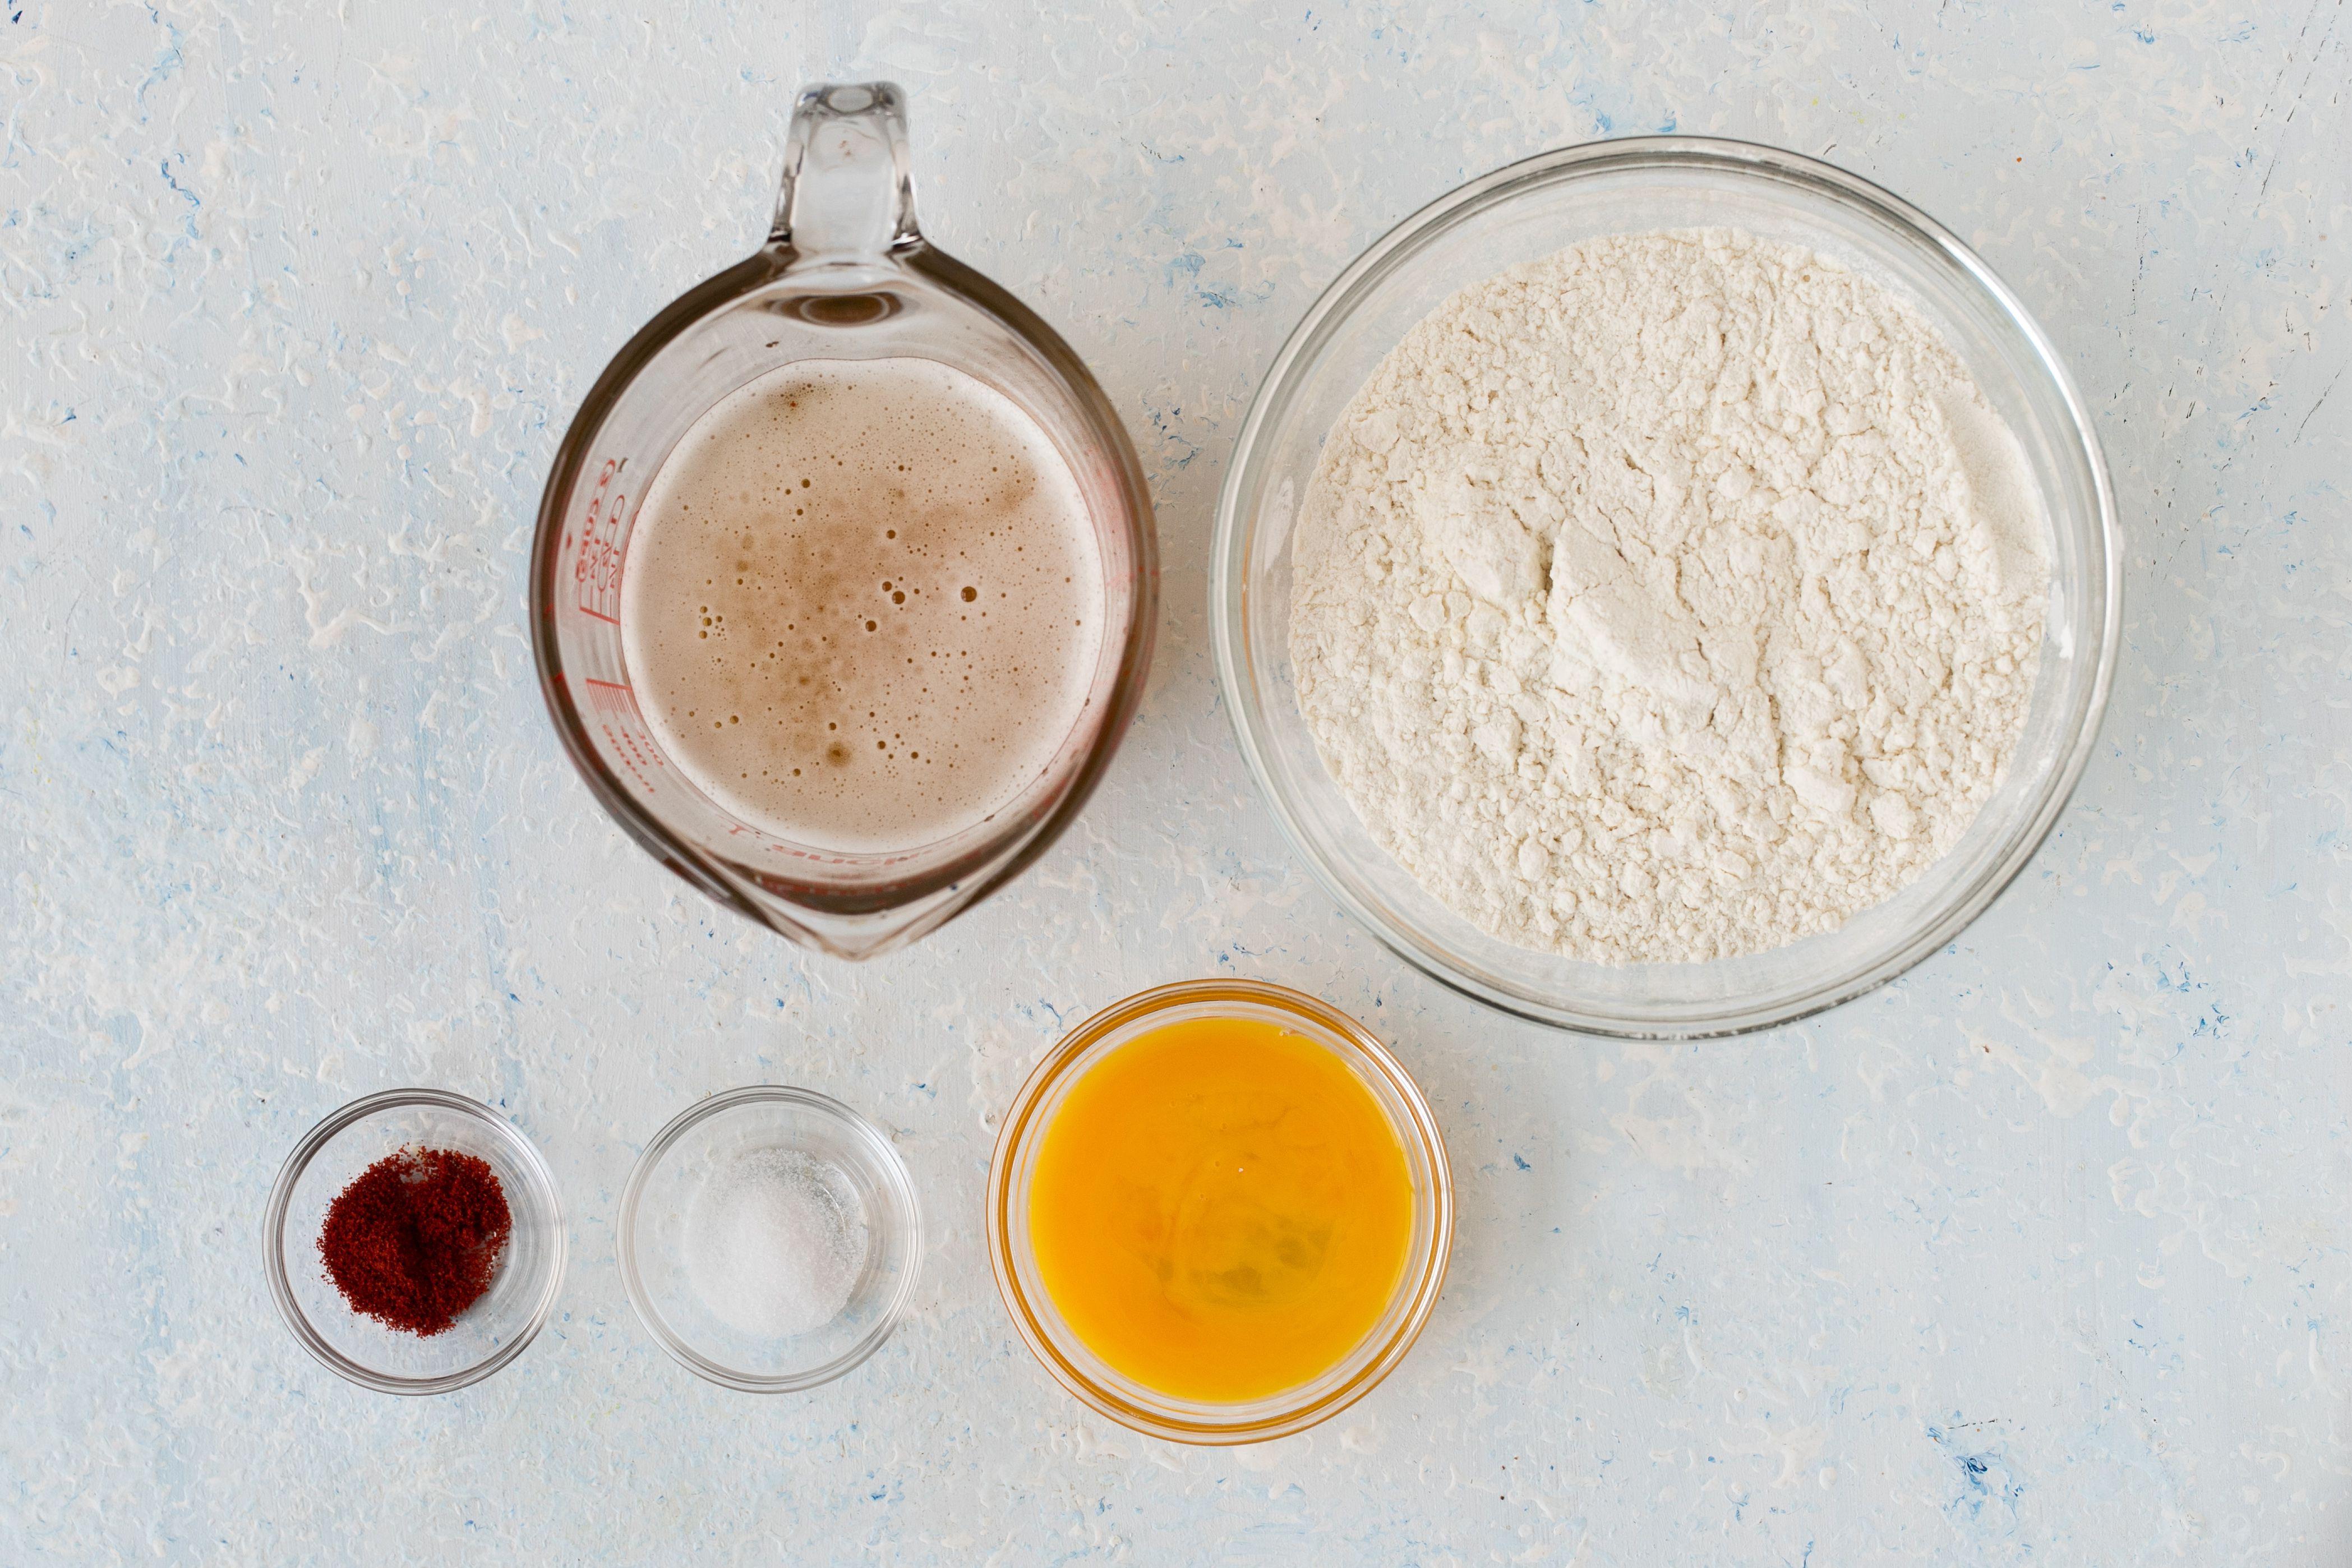 Classic Beer Batter Recipe for Deep-Frying